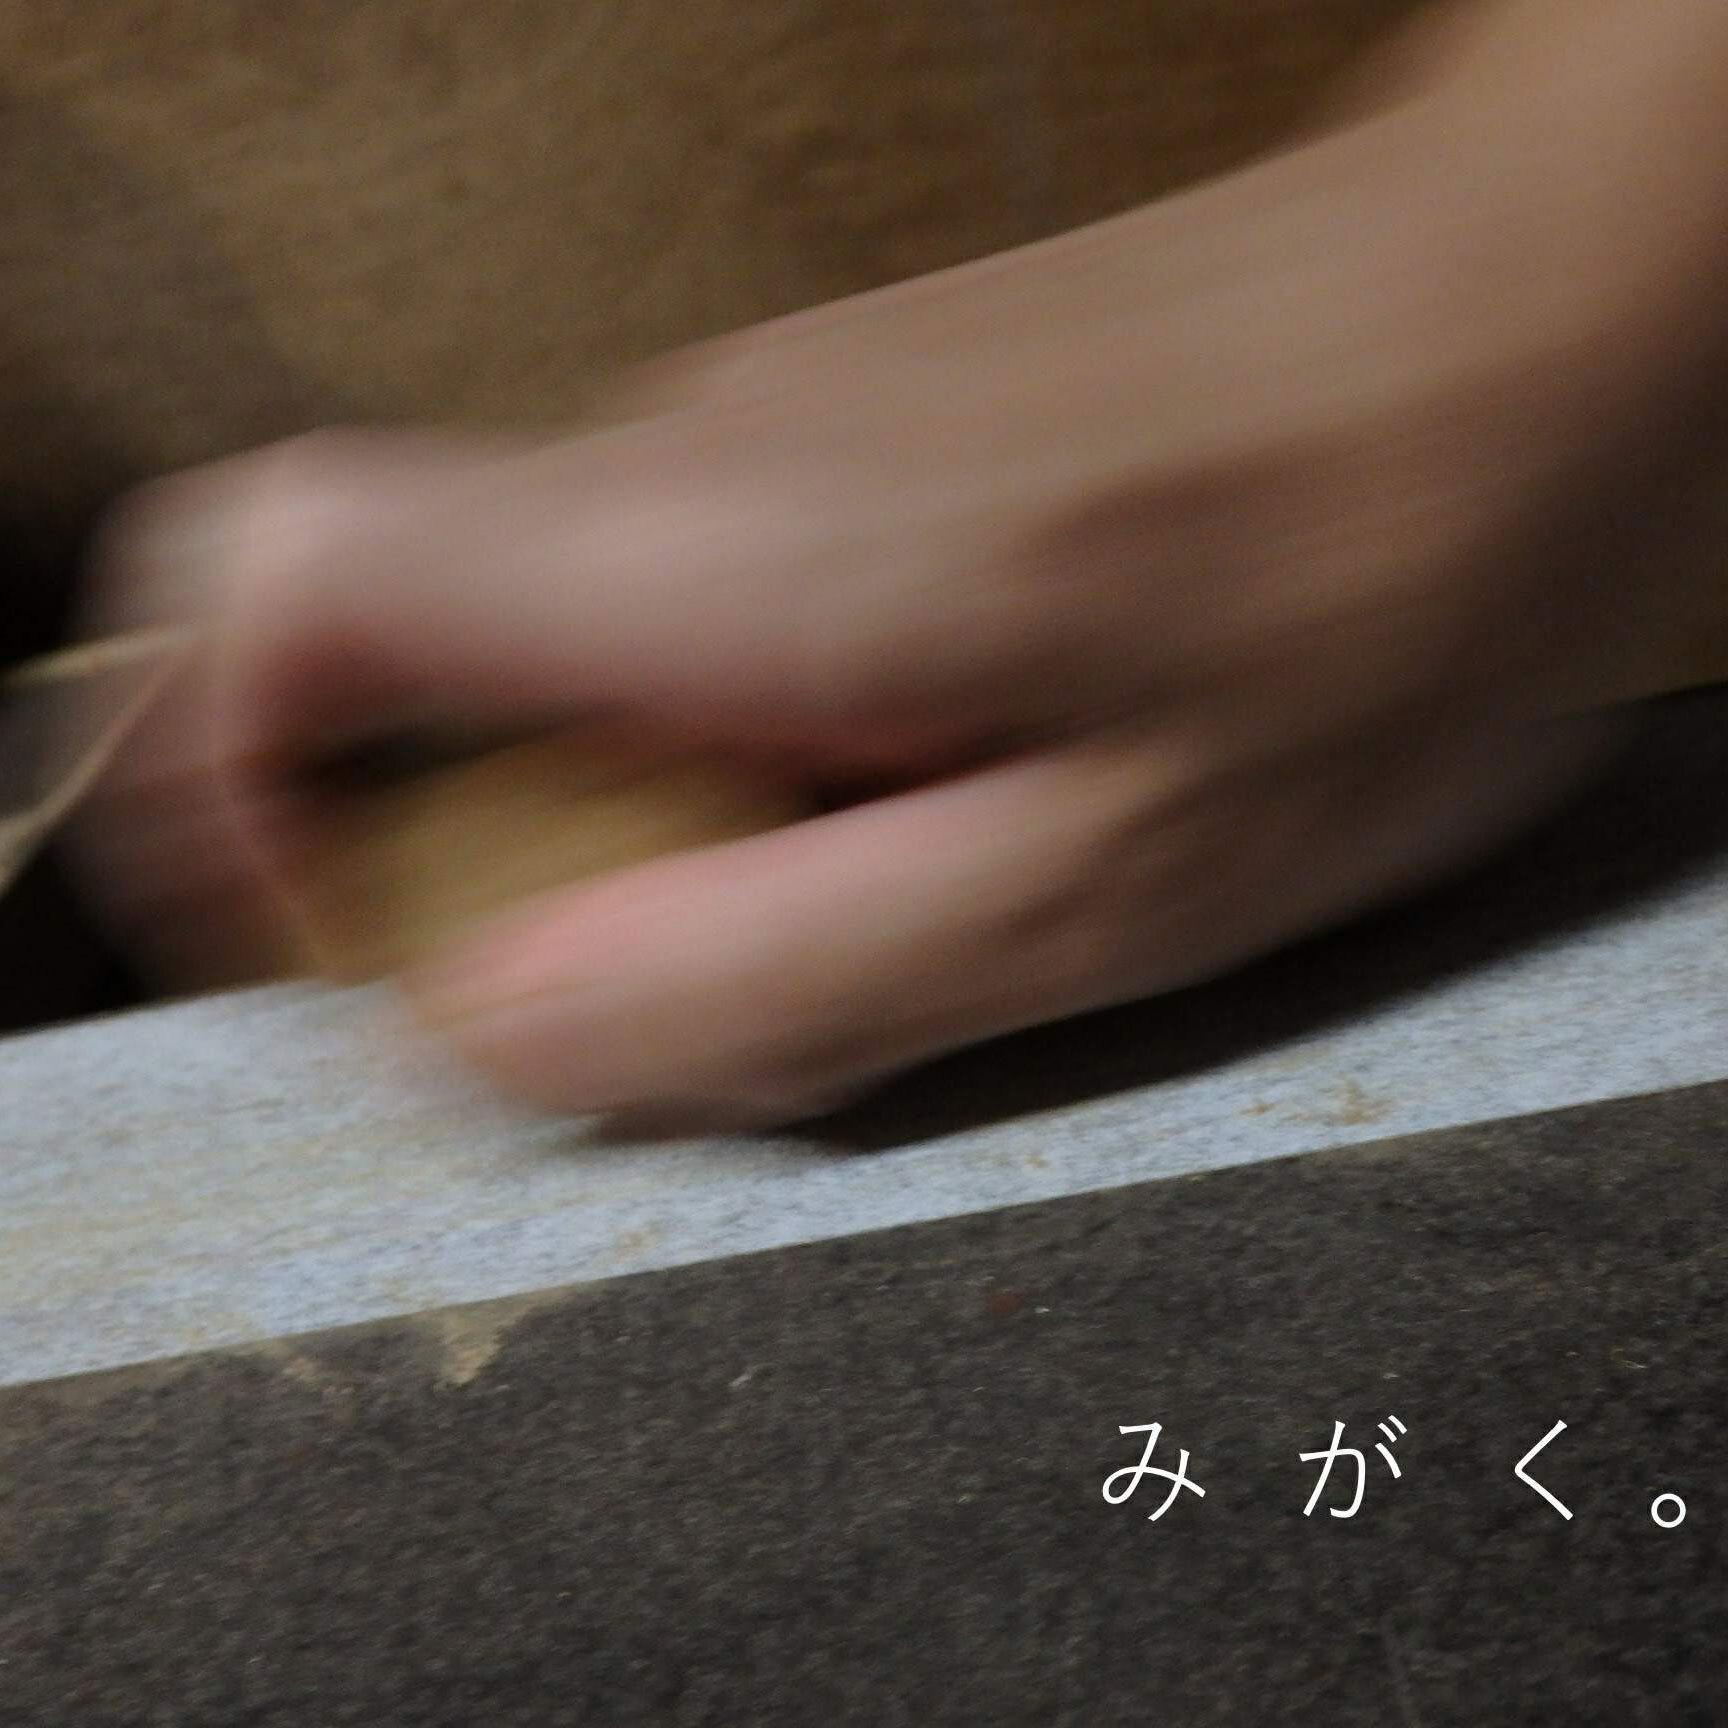 【WS】63mokko『みがく』